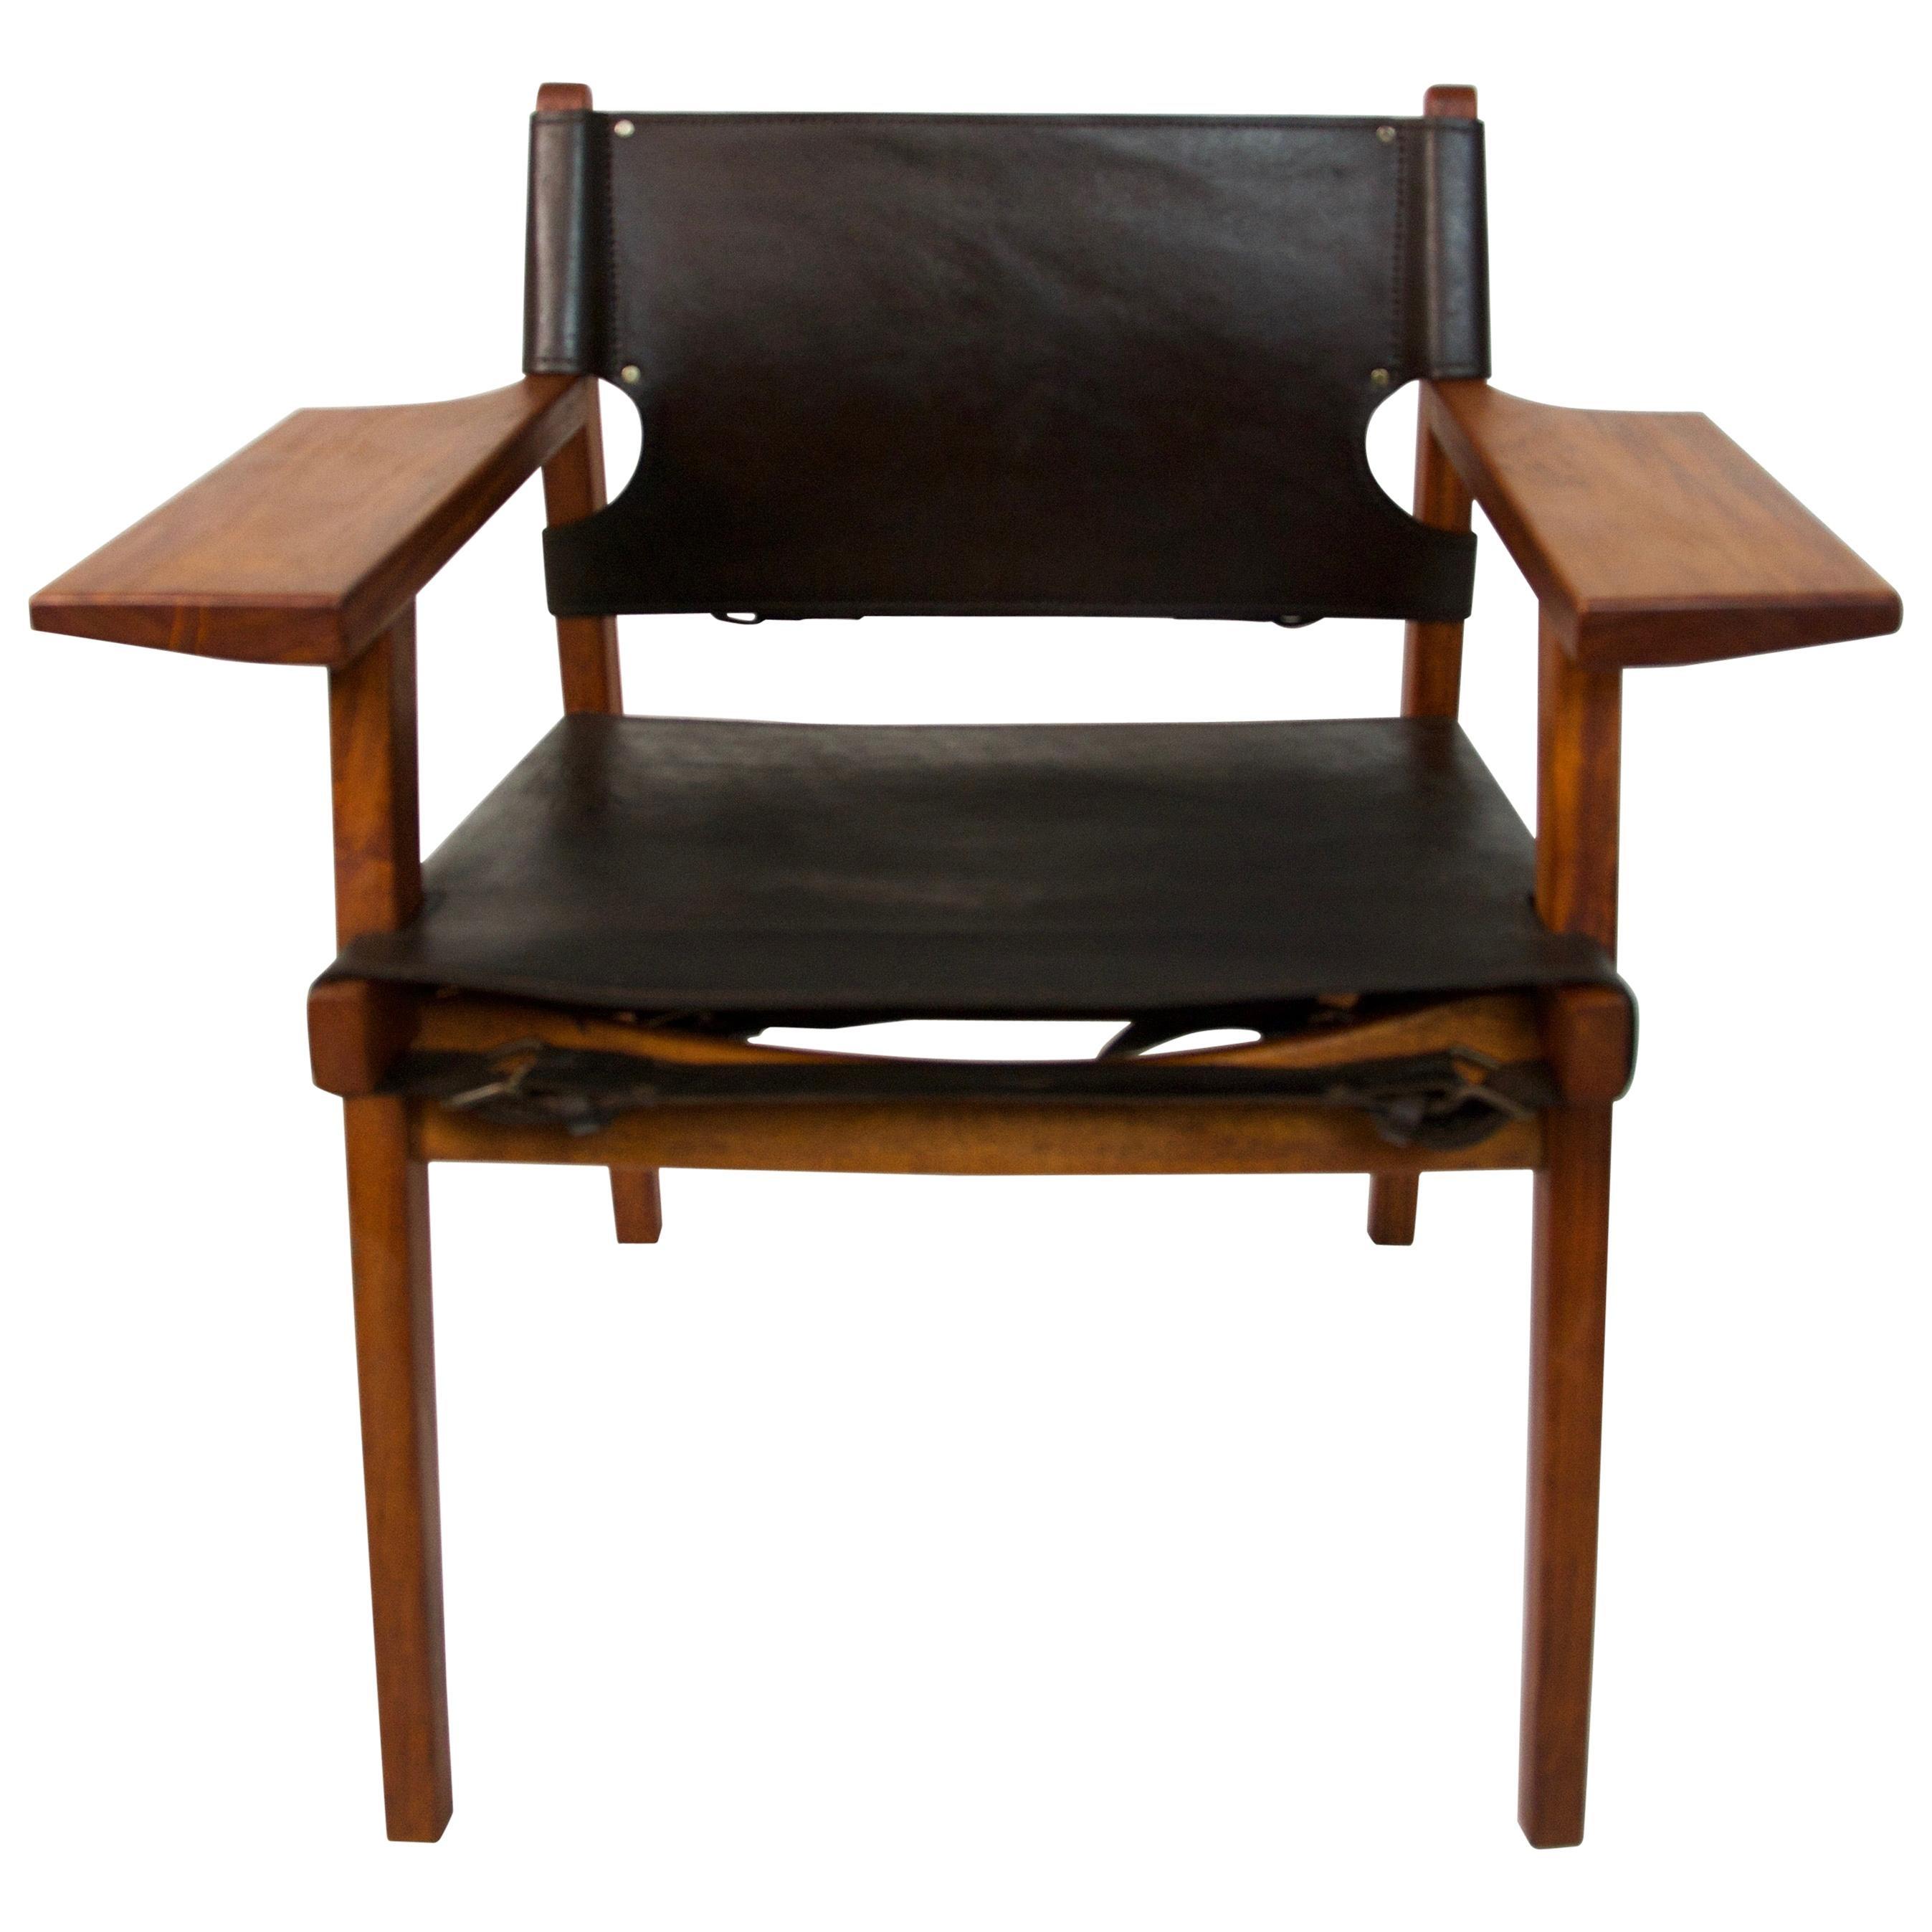 Spanish Chair Borge Mogensen Style Teak and Leather, circa 1960